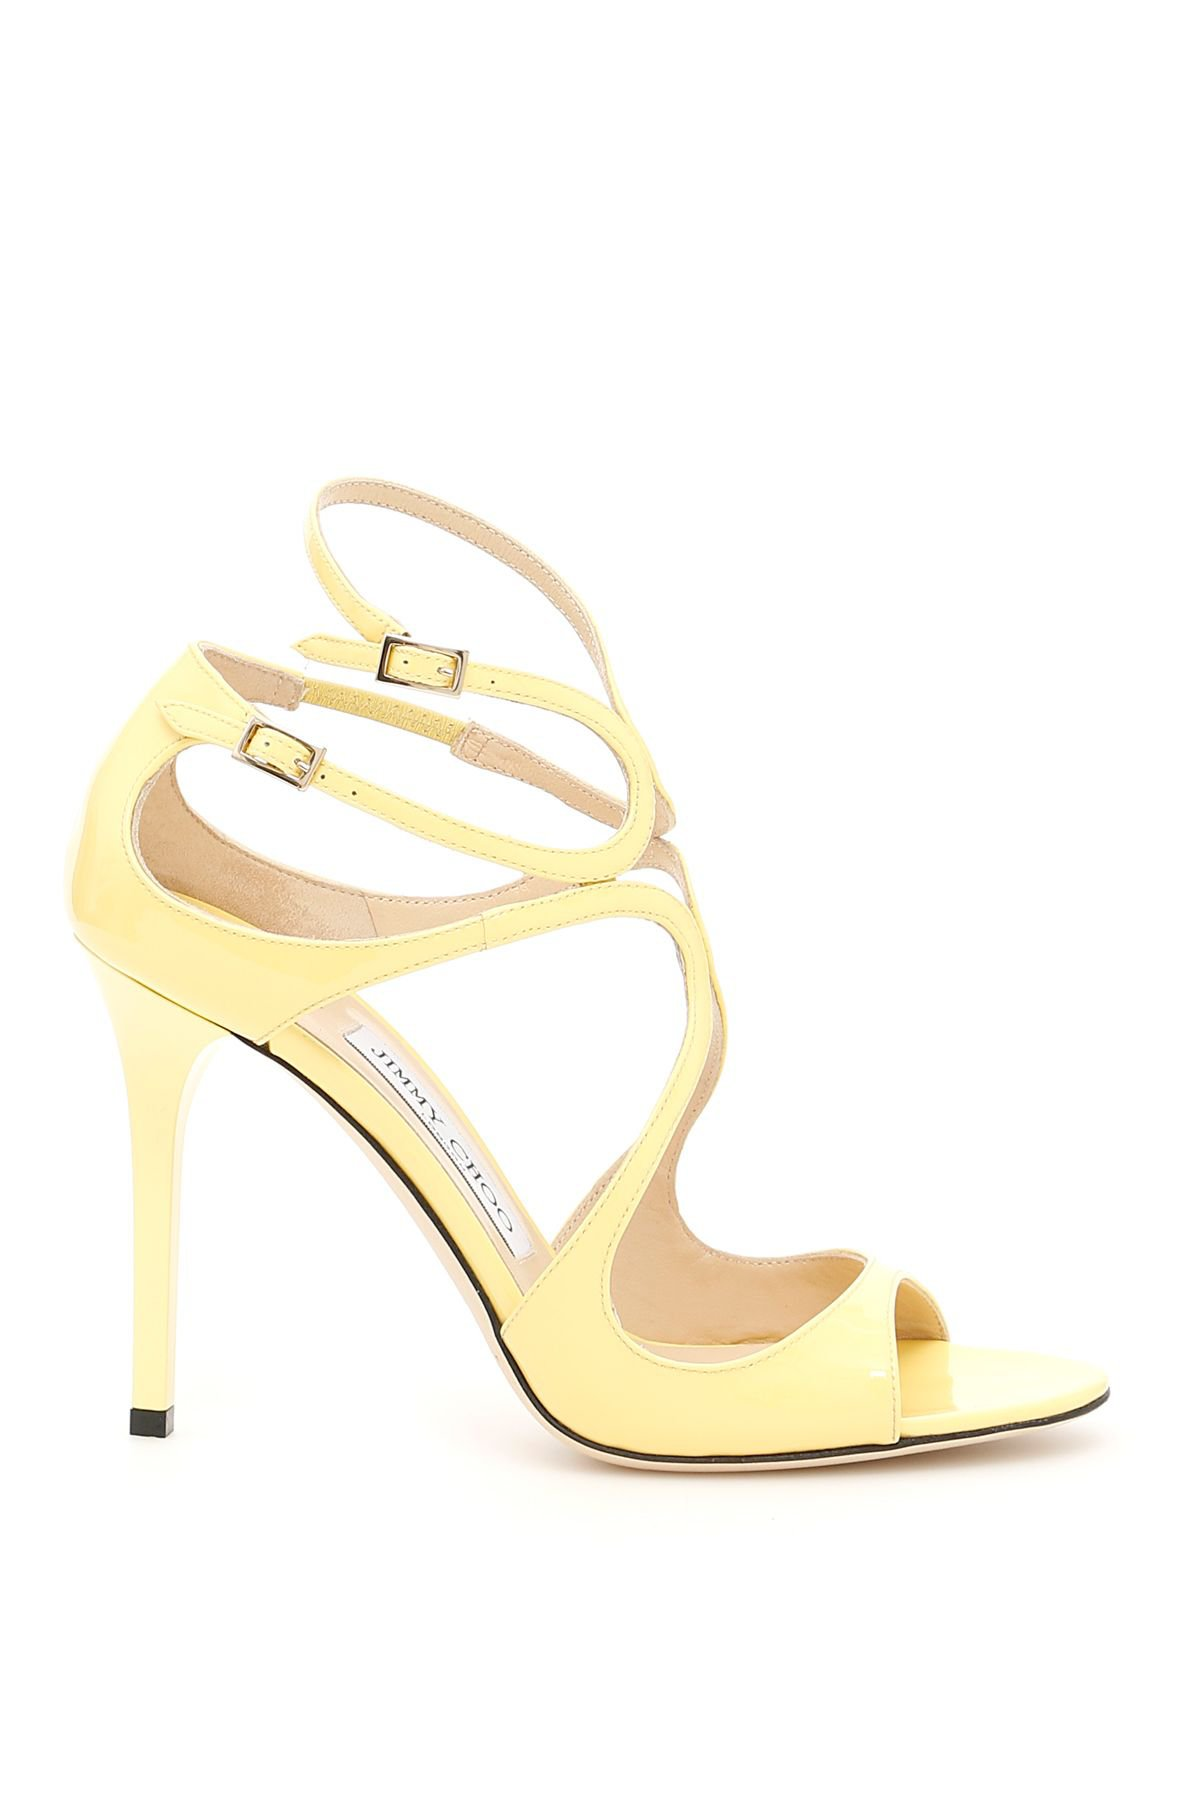 Jimmy Choo Lang Patent Sandals